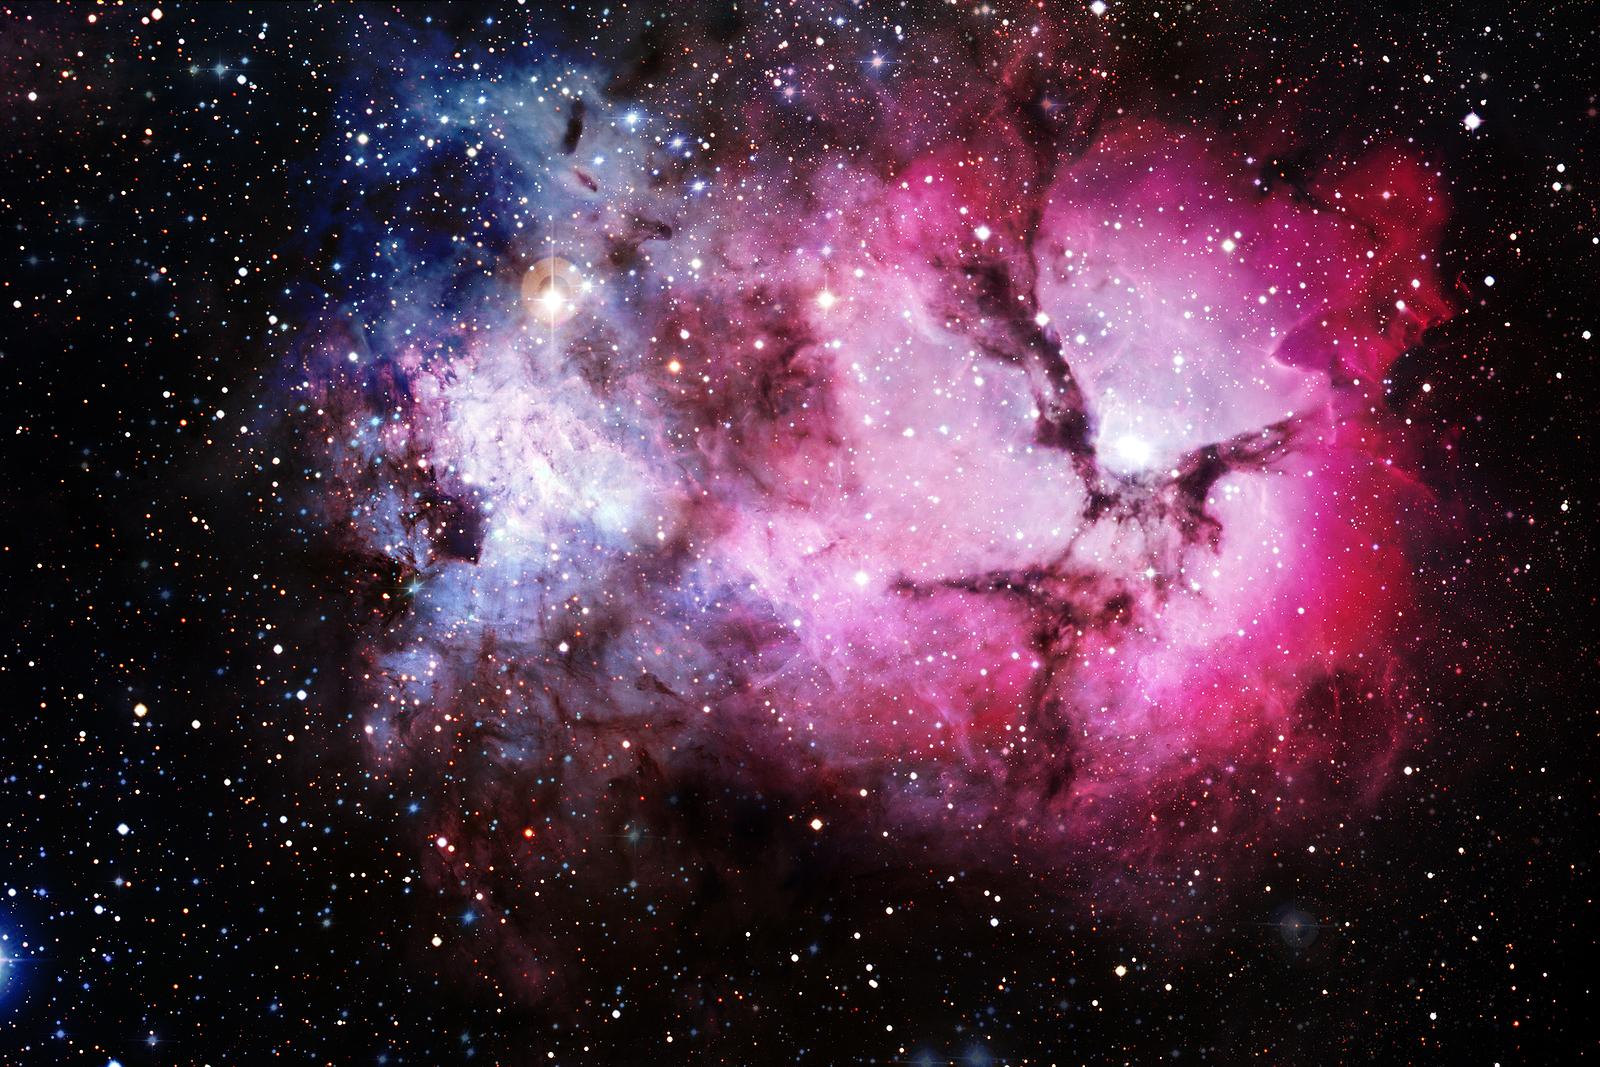 Hubble Telescope Photo by Linda Brice